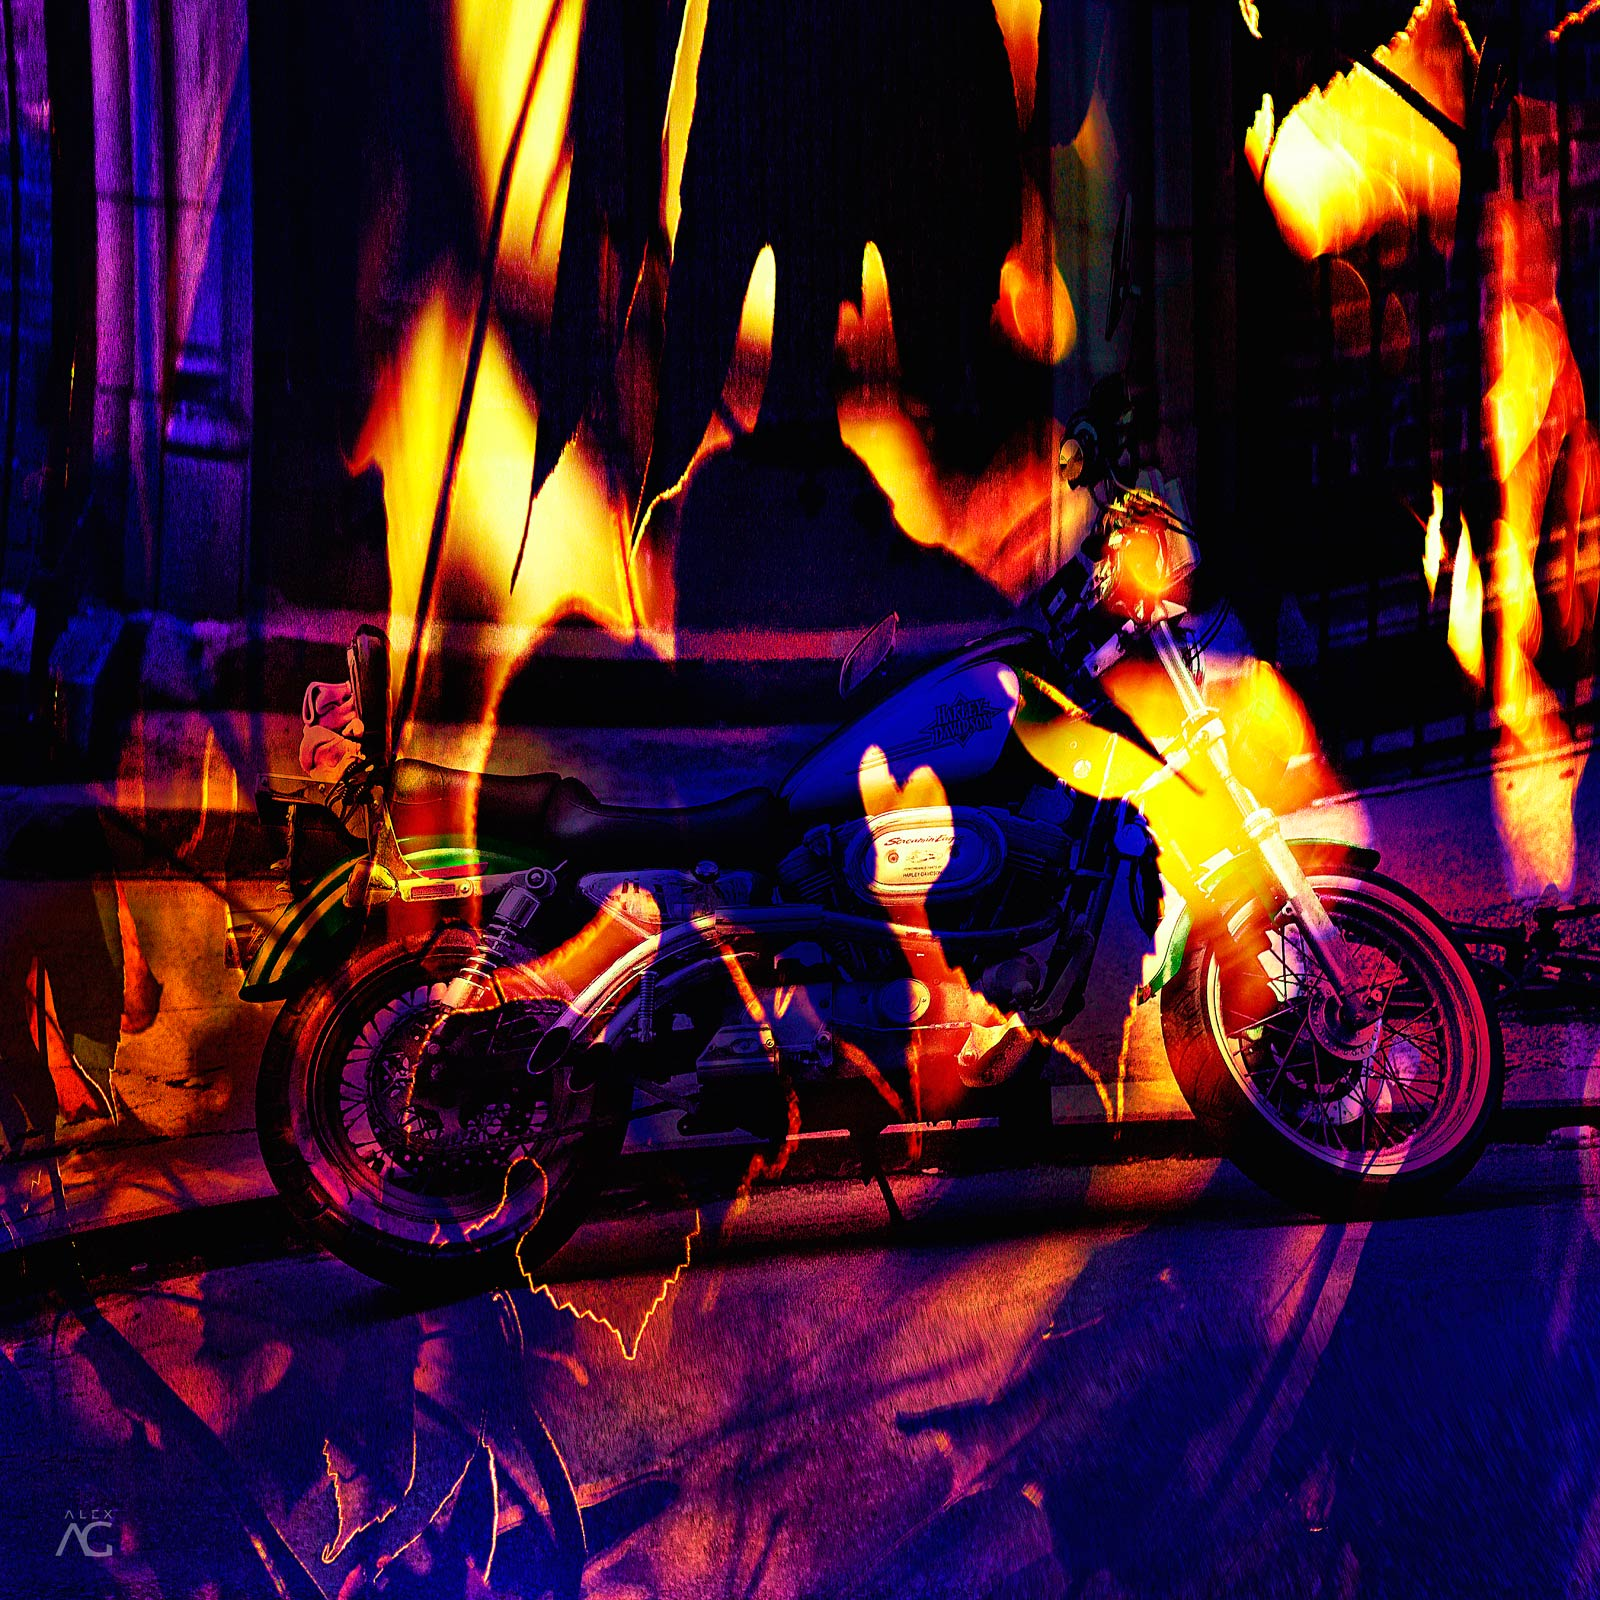 BacklitLeavesInProspectPark_channelMixed_1600_The Autumn Ride